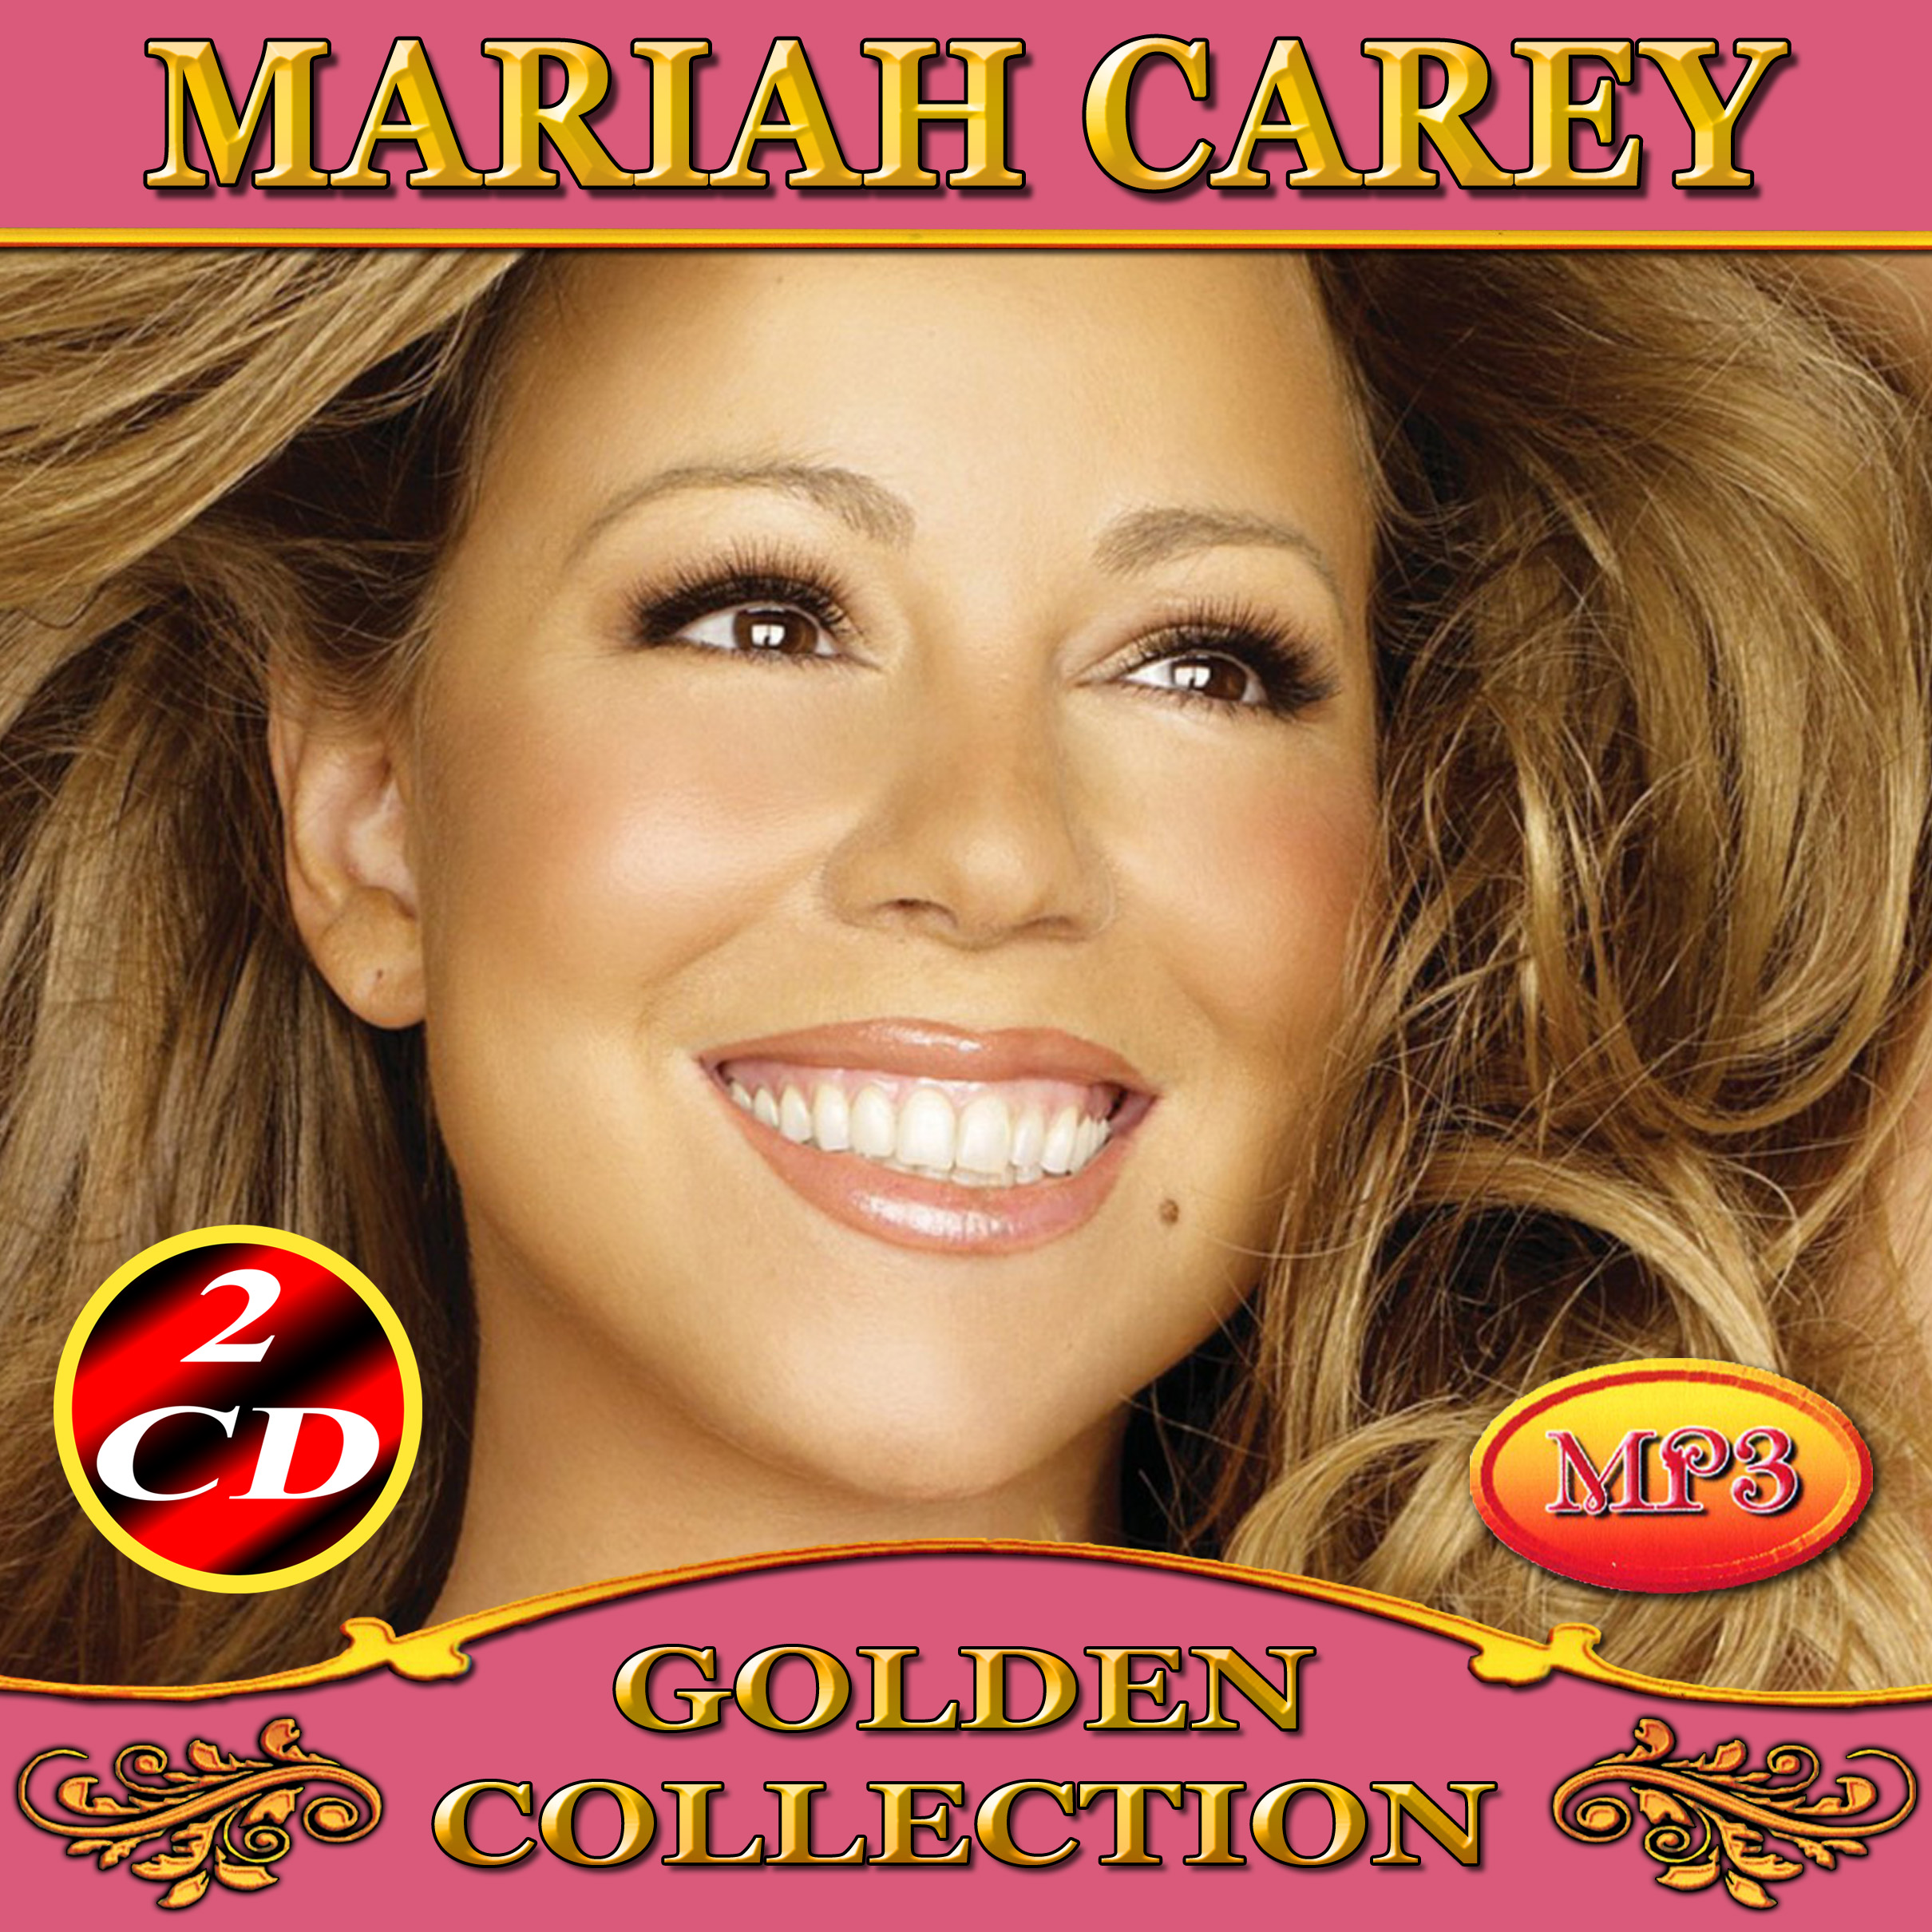 Mariah Carey 2cd [mp3]